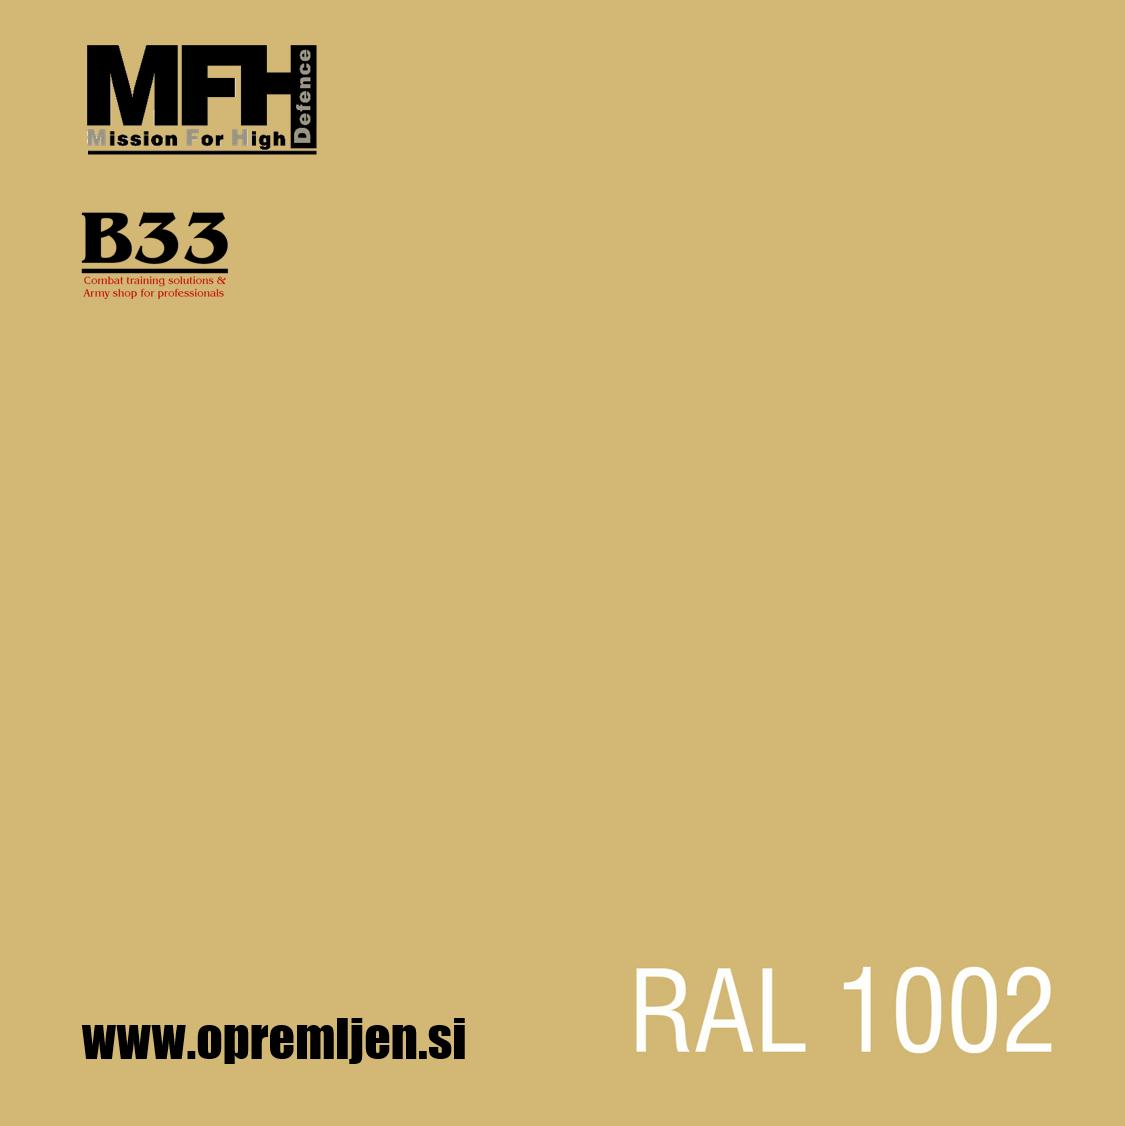 Vojaška barva sprej svetlo peščena KHAKI mat RAL1002 400ml MFH - Max Fuchs by B33 army shop at www.opremljen.si